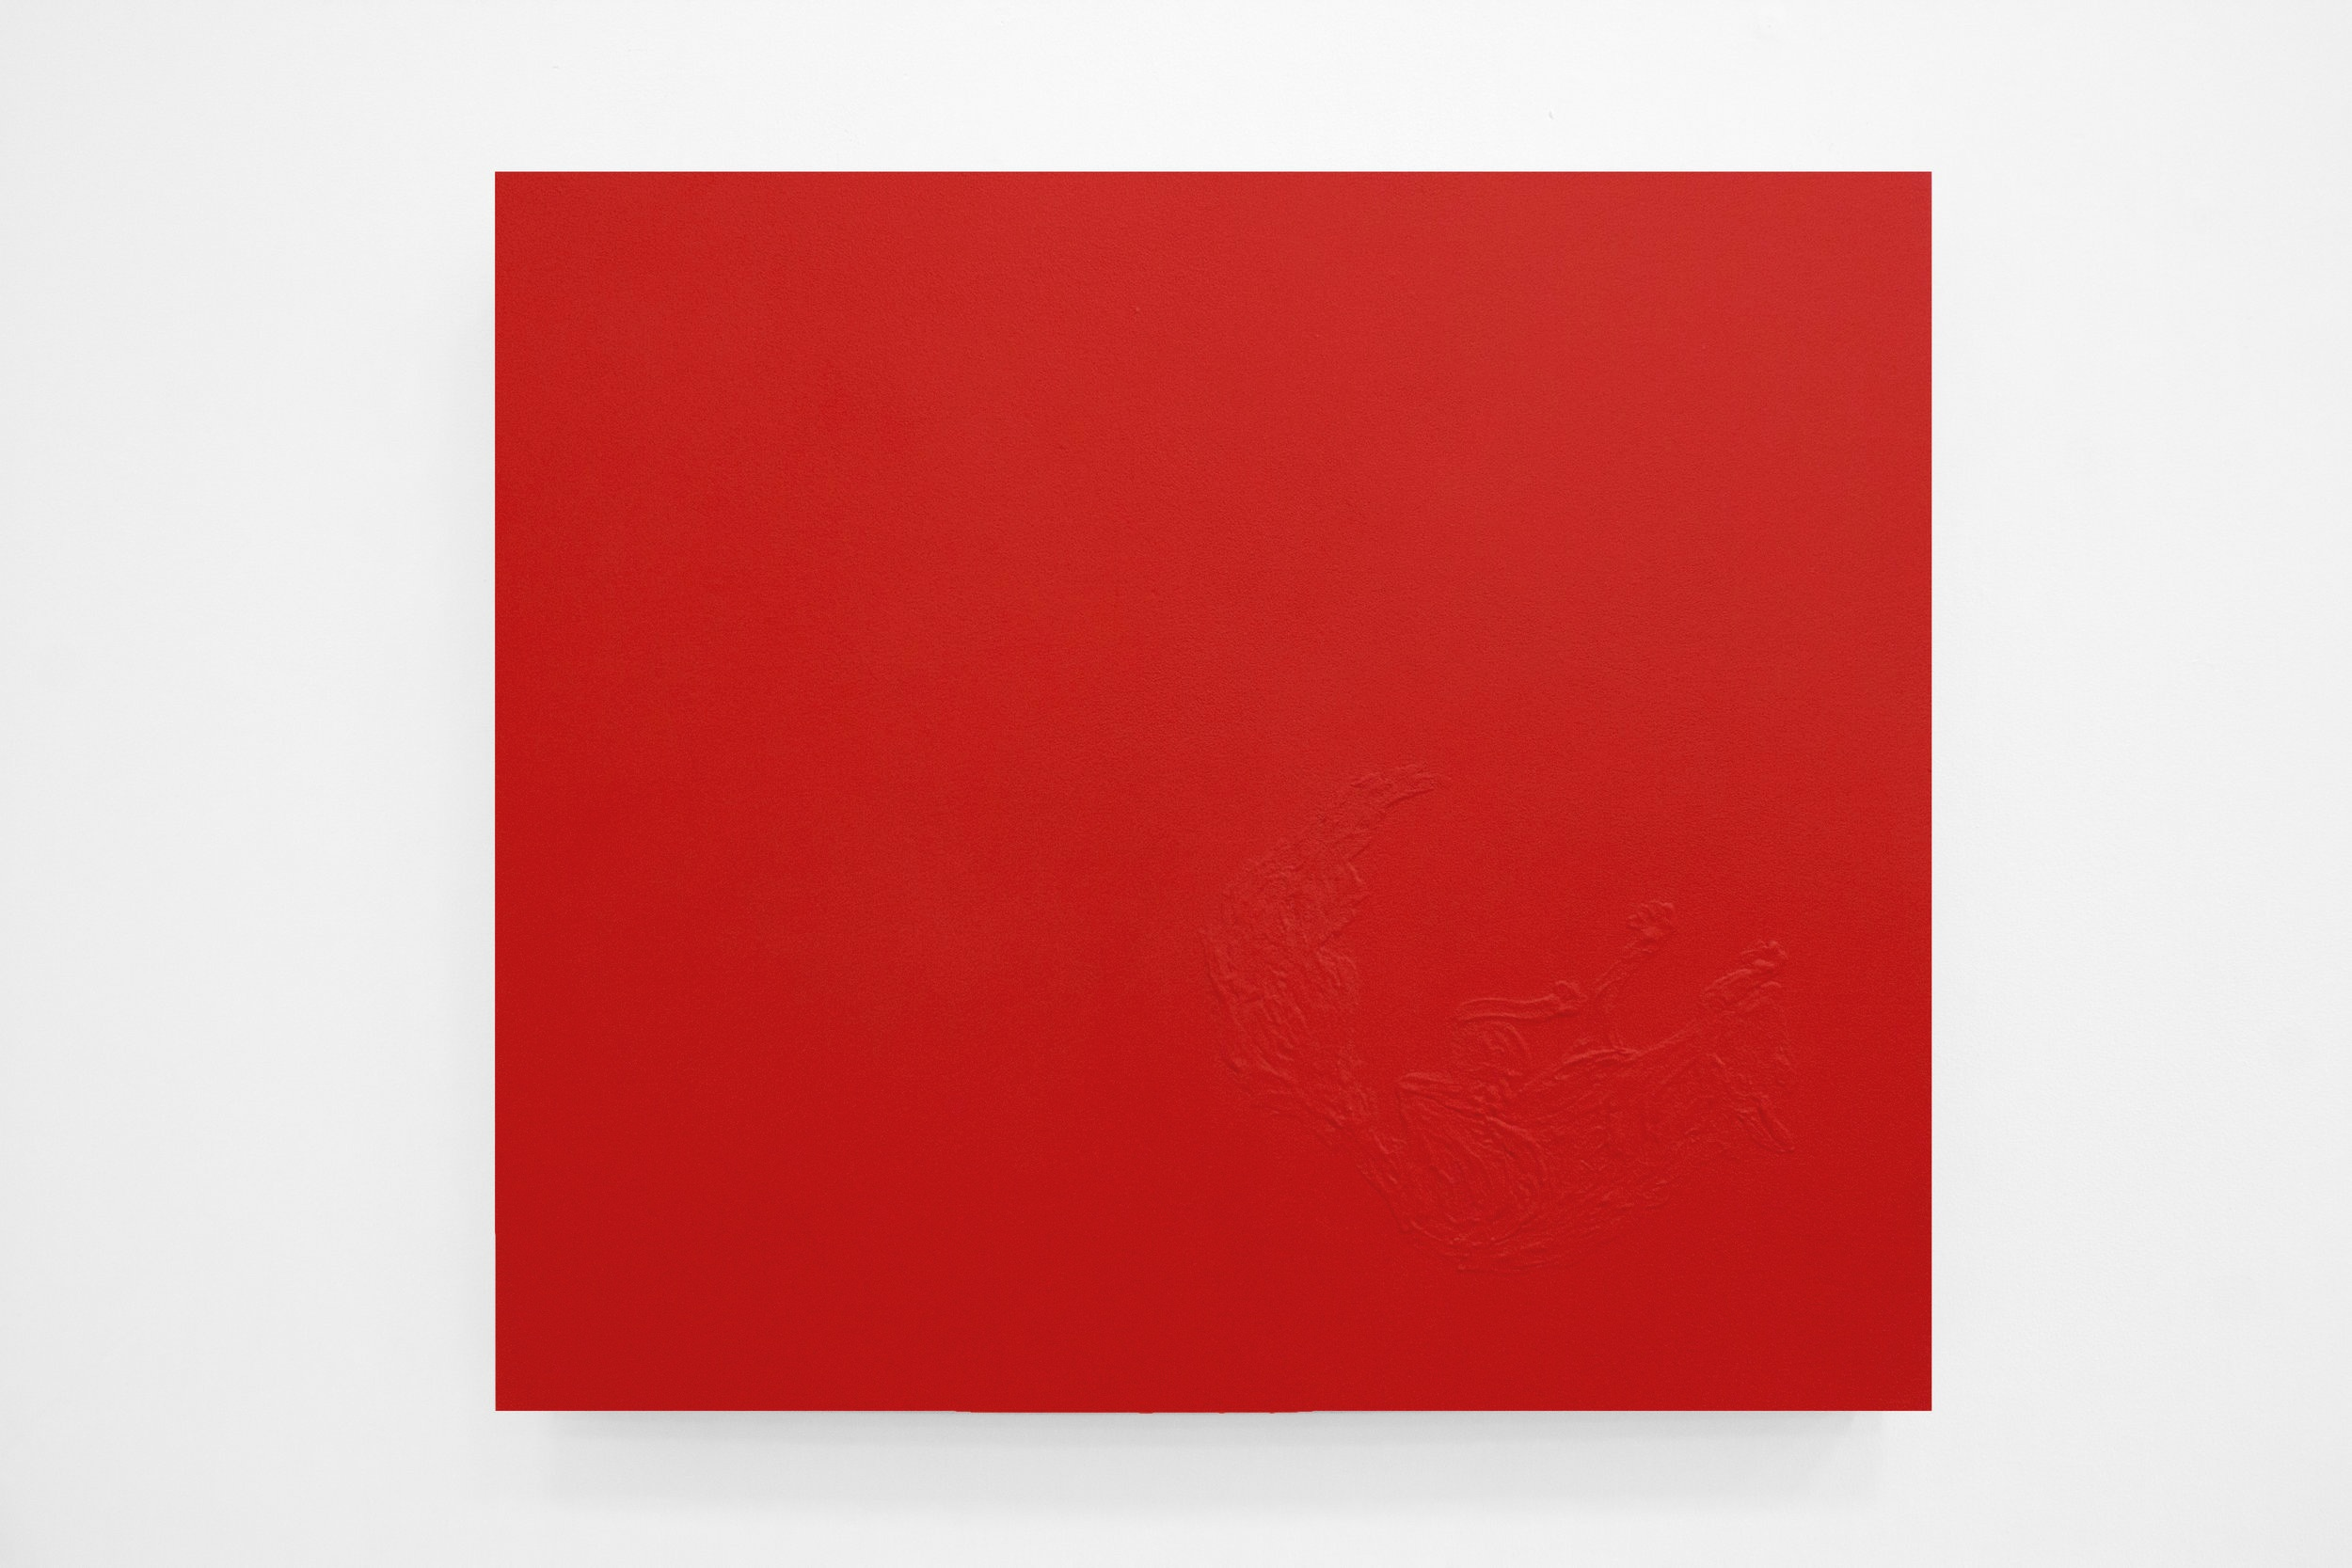 Meagan-Hindel-Red.jpg